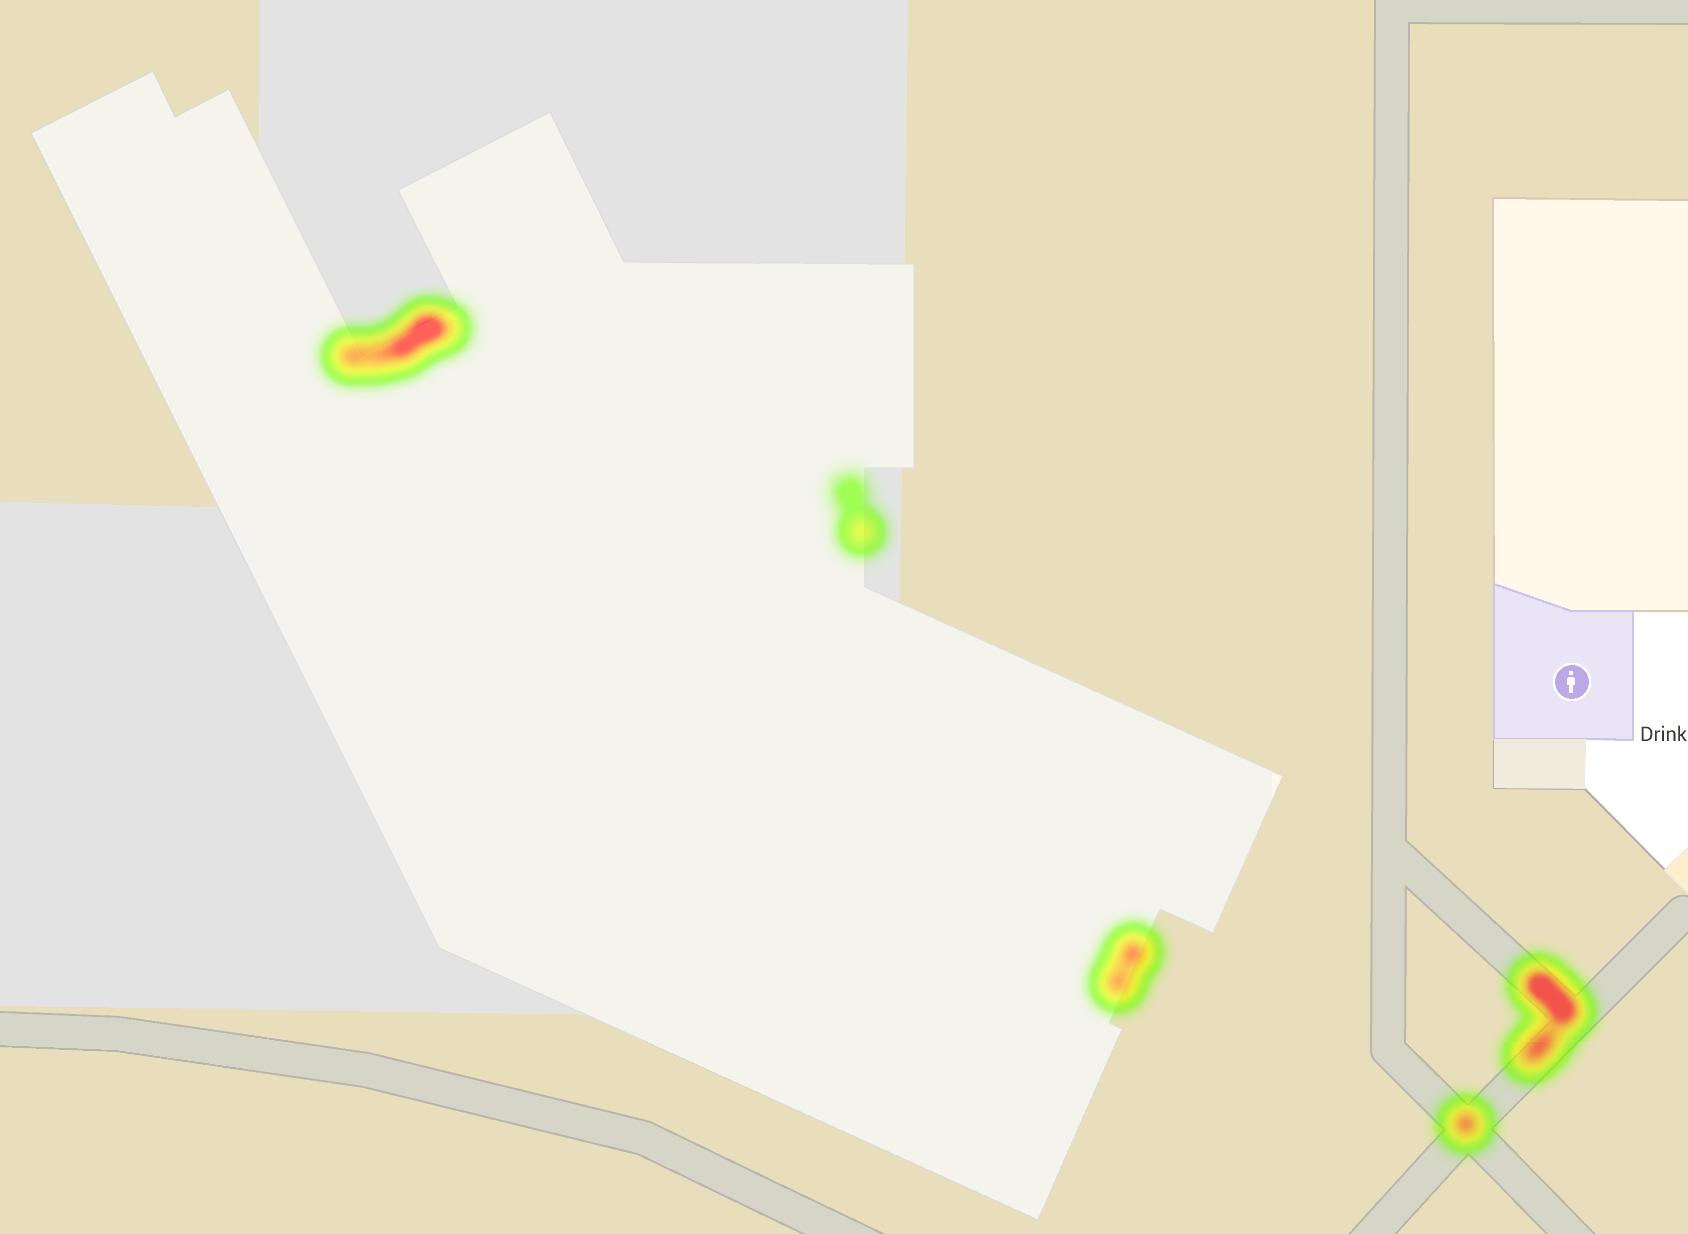 Heatmap